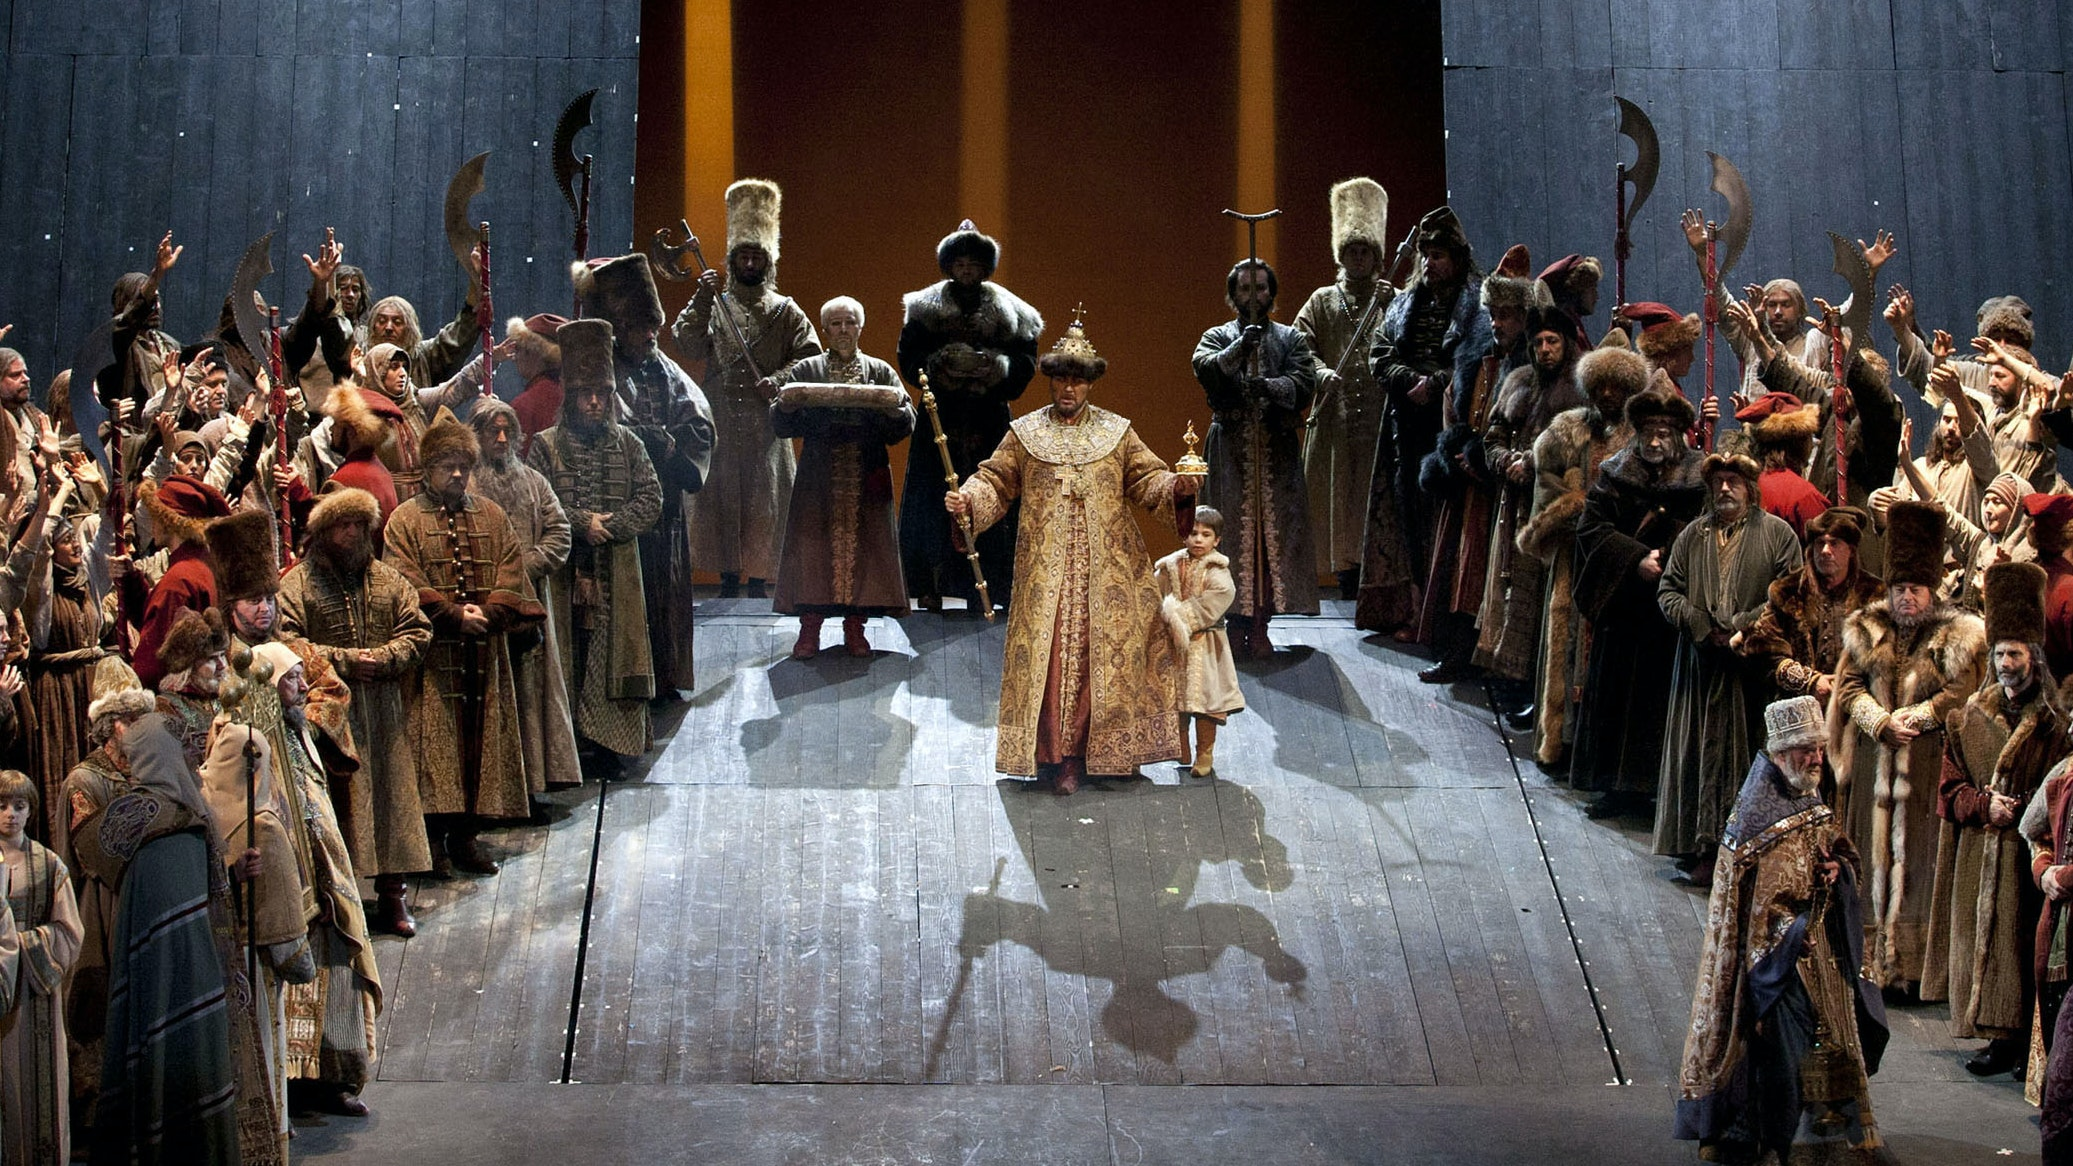 Boris Godunov, Mussorgsky – A View from backstage